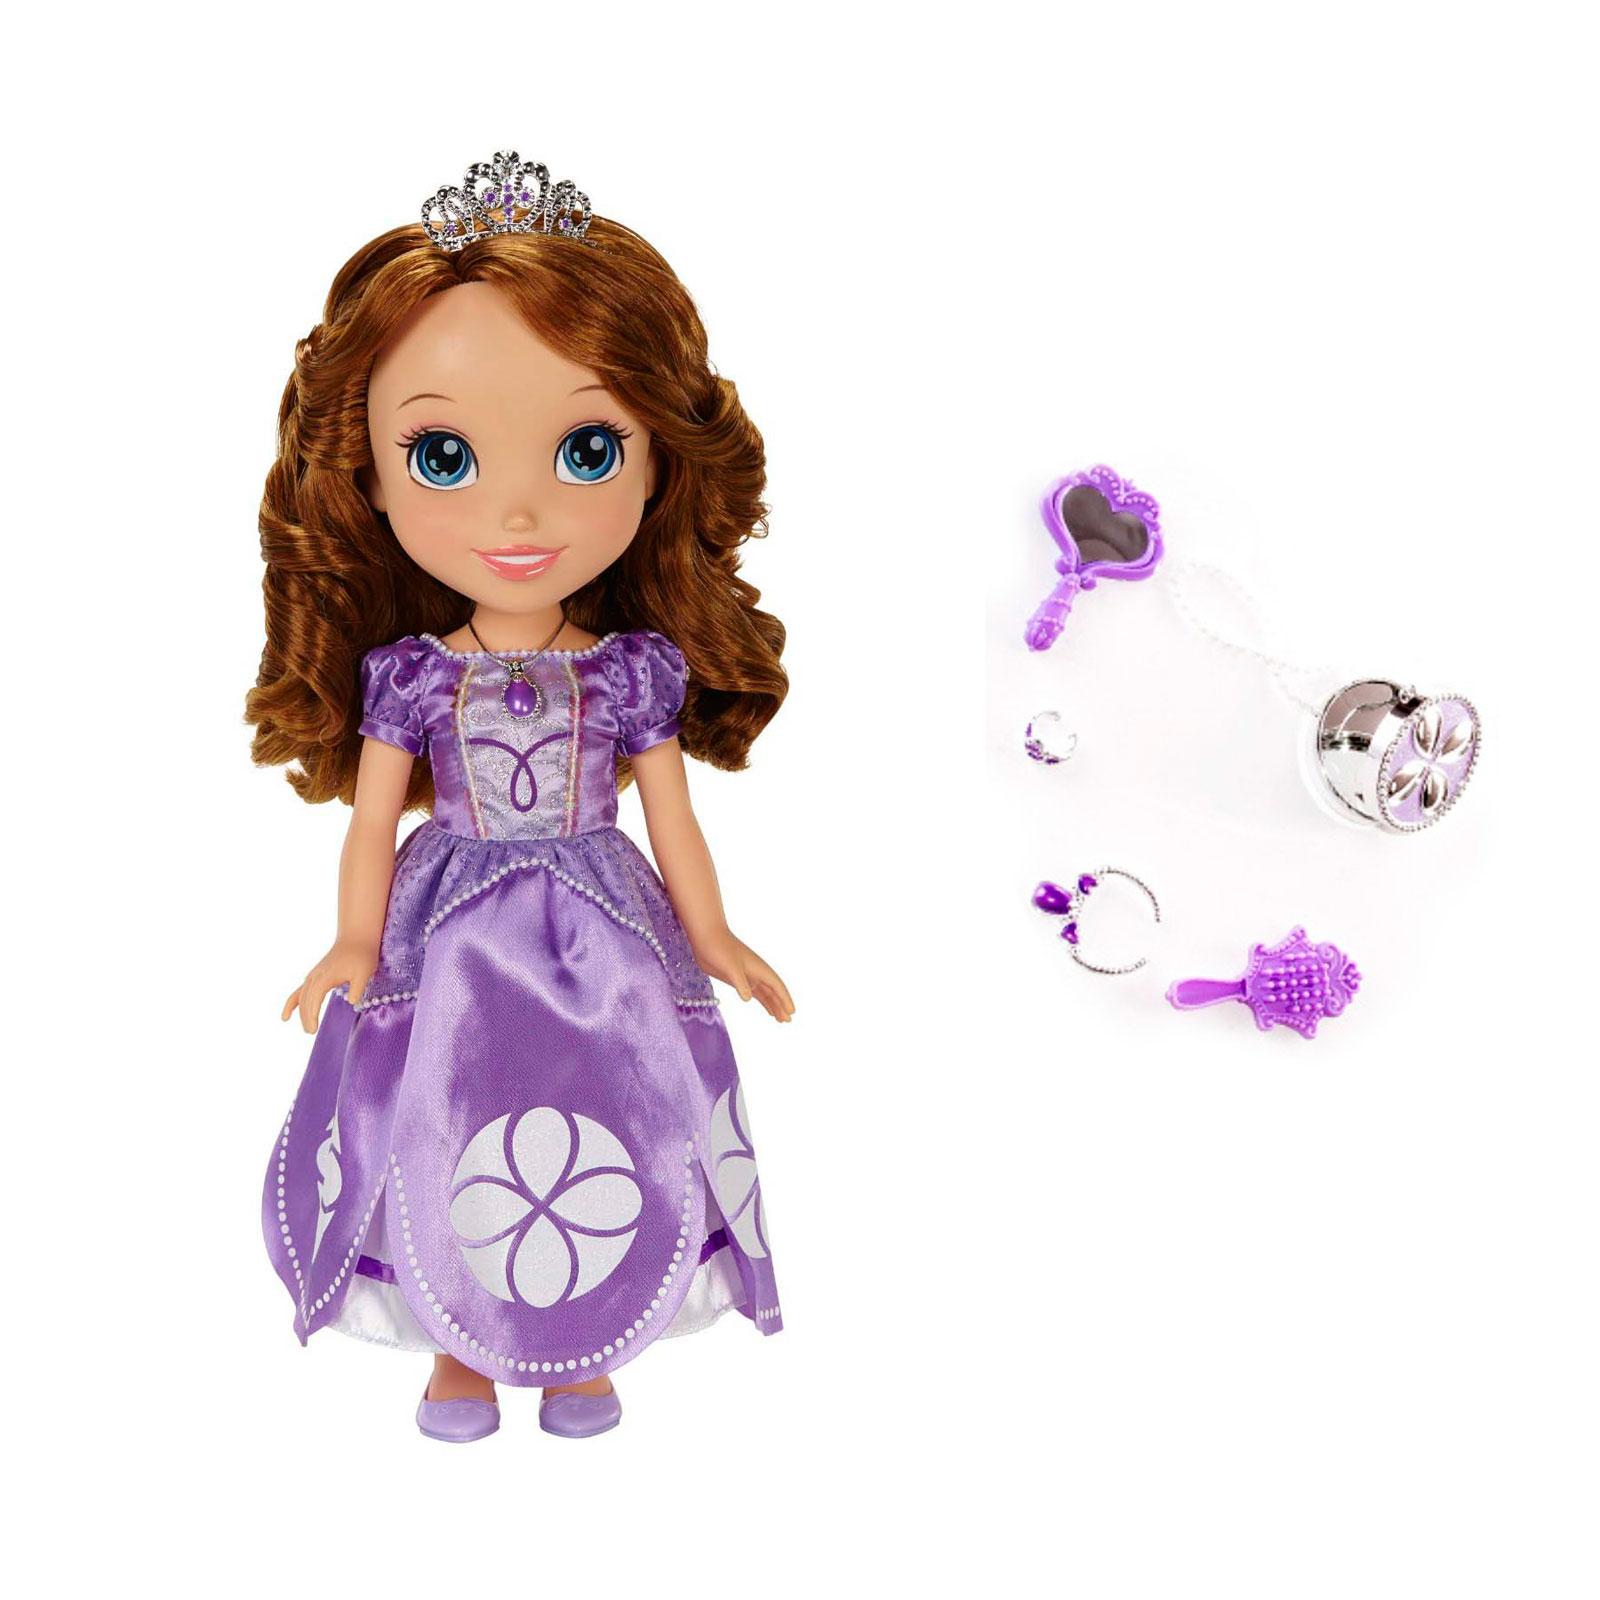 ����� Disney Princess ����� � ����������� ��� ����� 37 ��